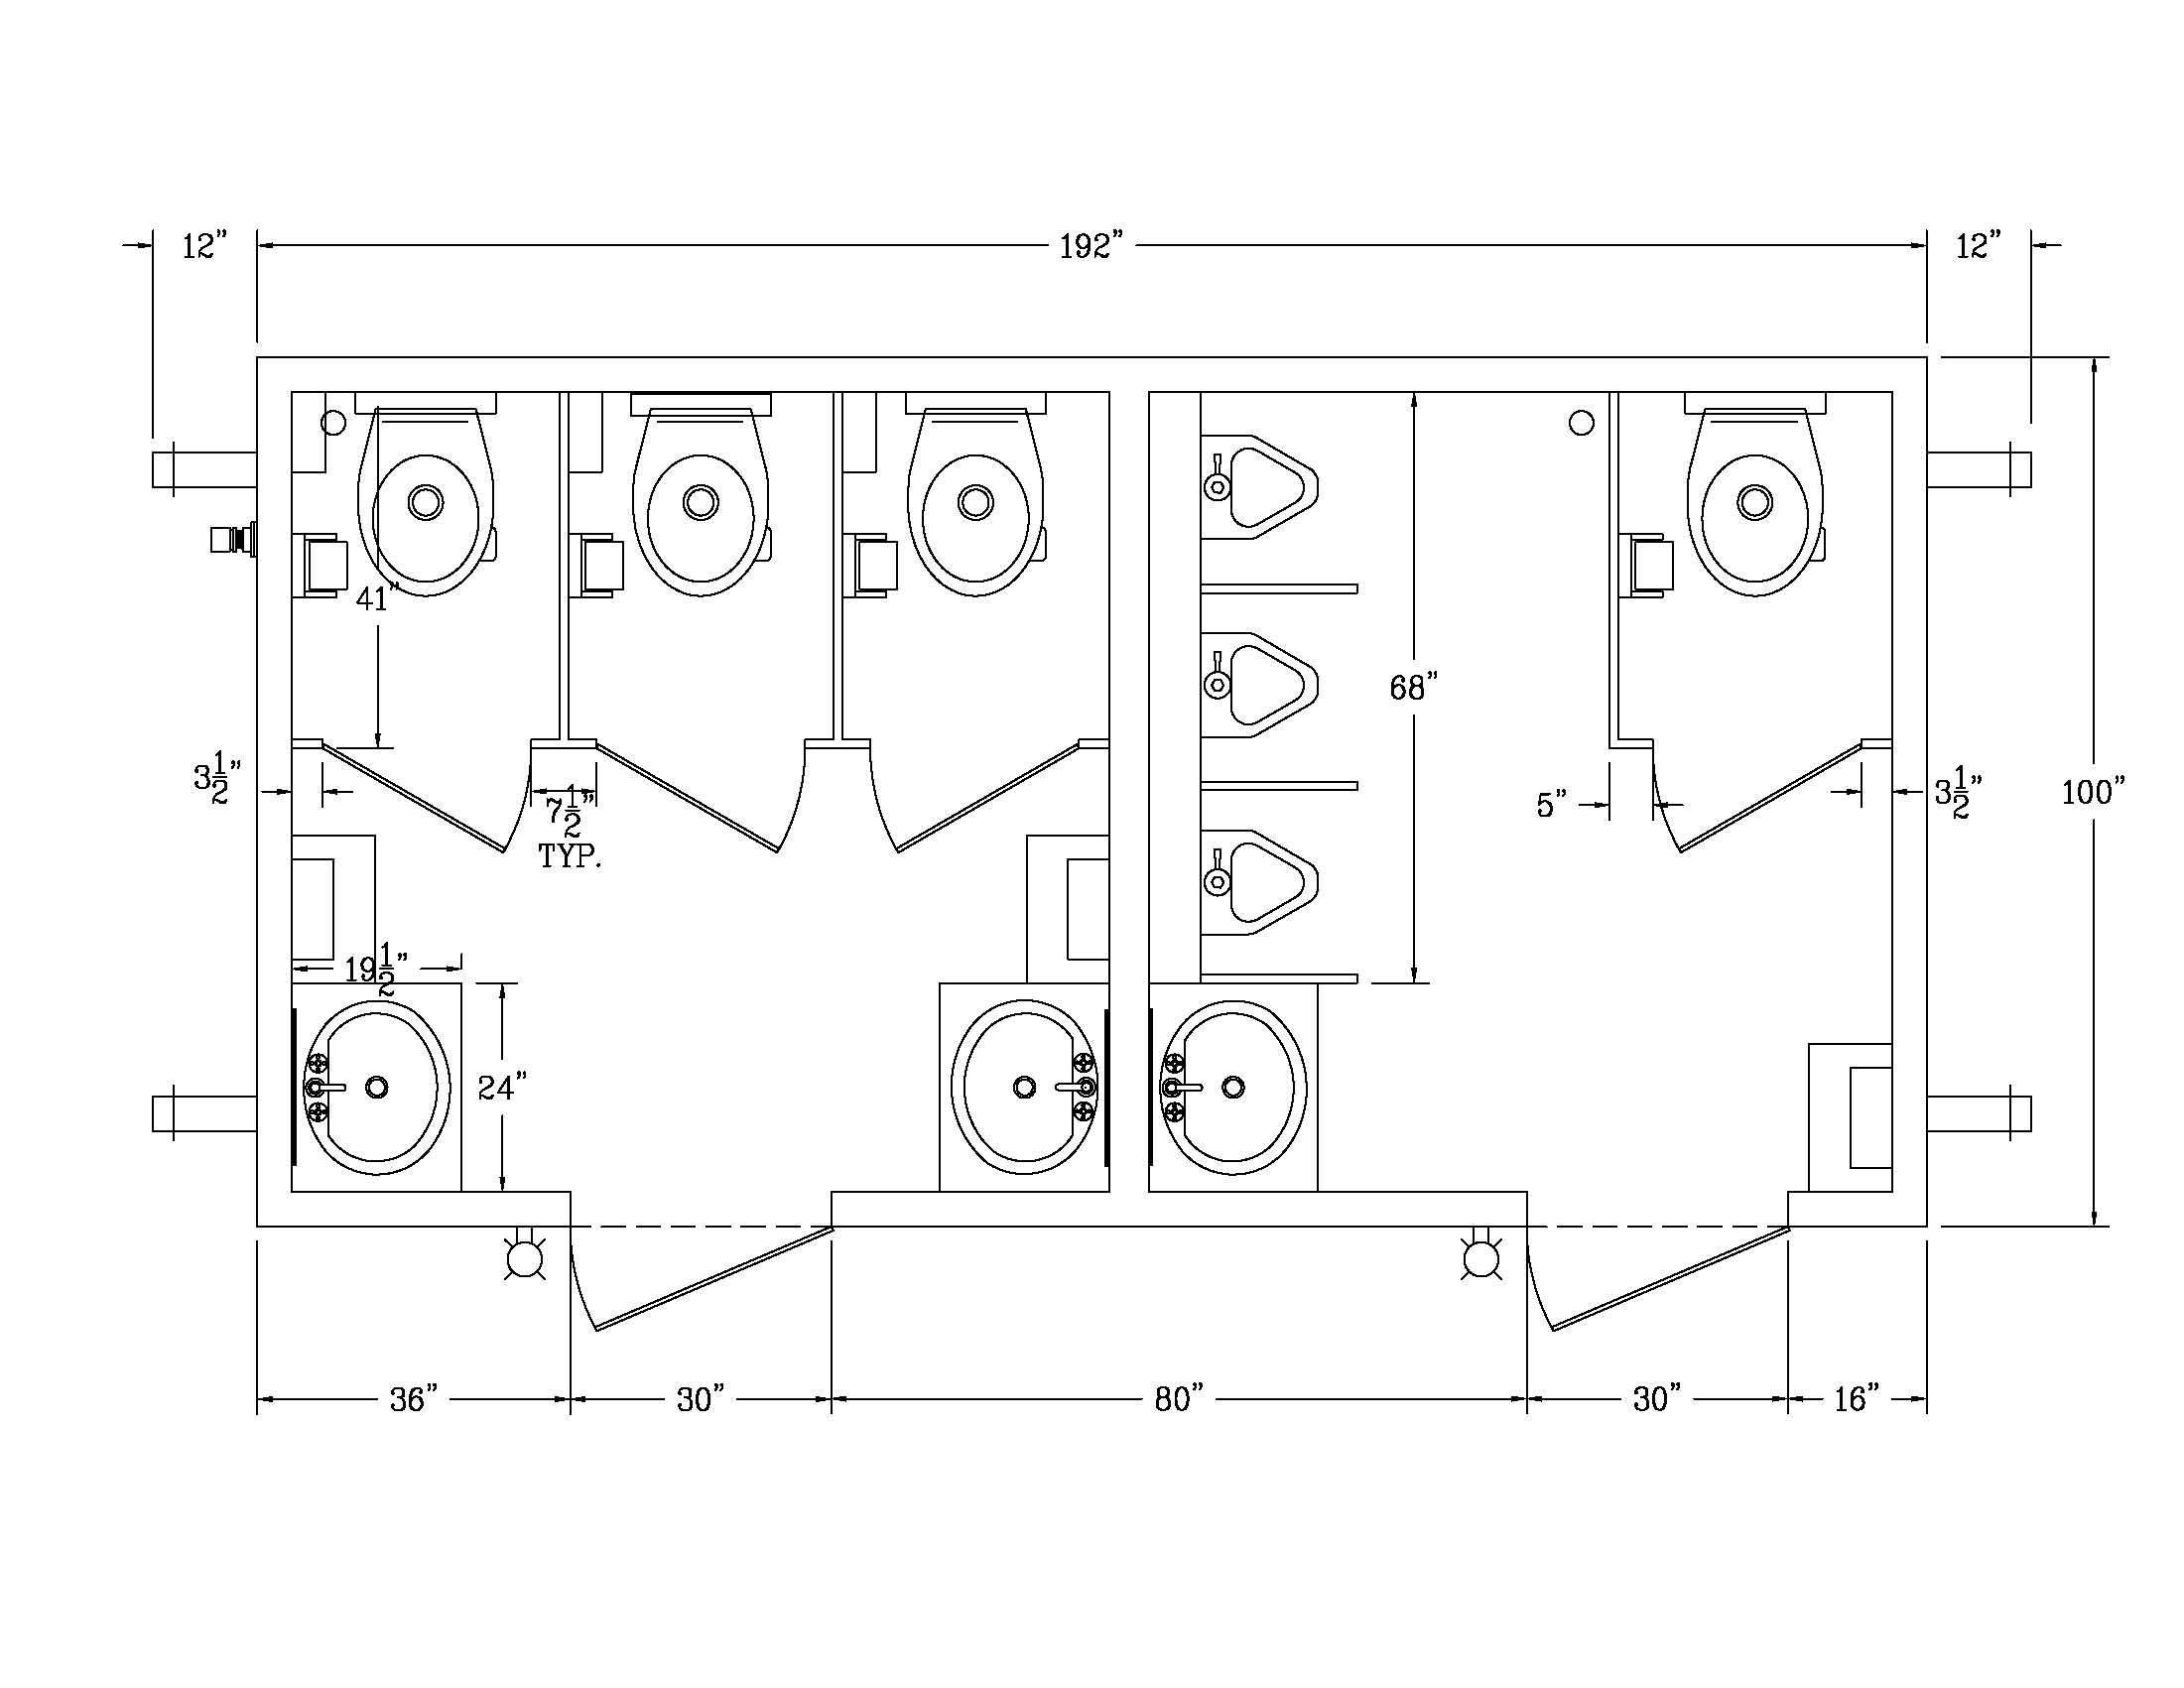 charming bathroom stall dimensions part 1 public bathroom stall dimensions [ 2201 x 1701 Pixel ]